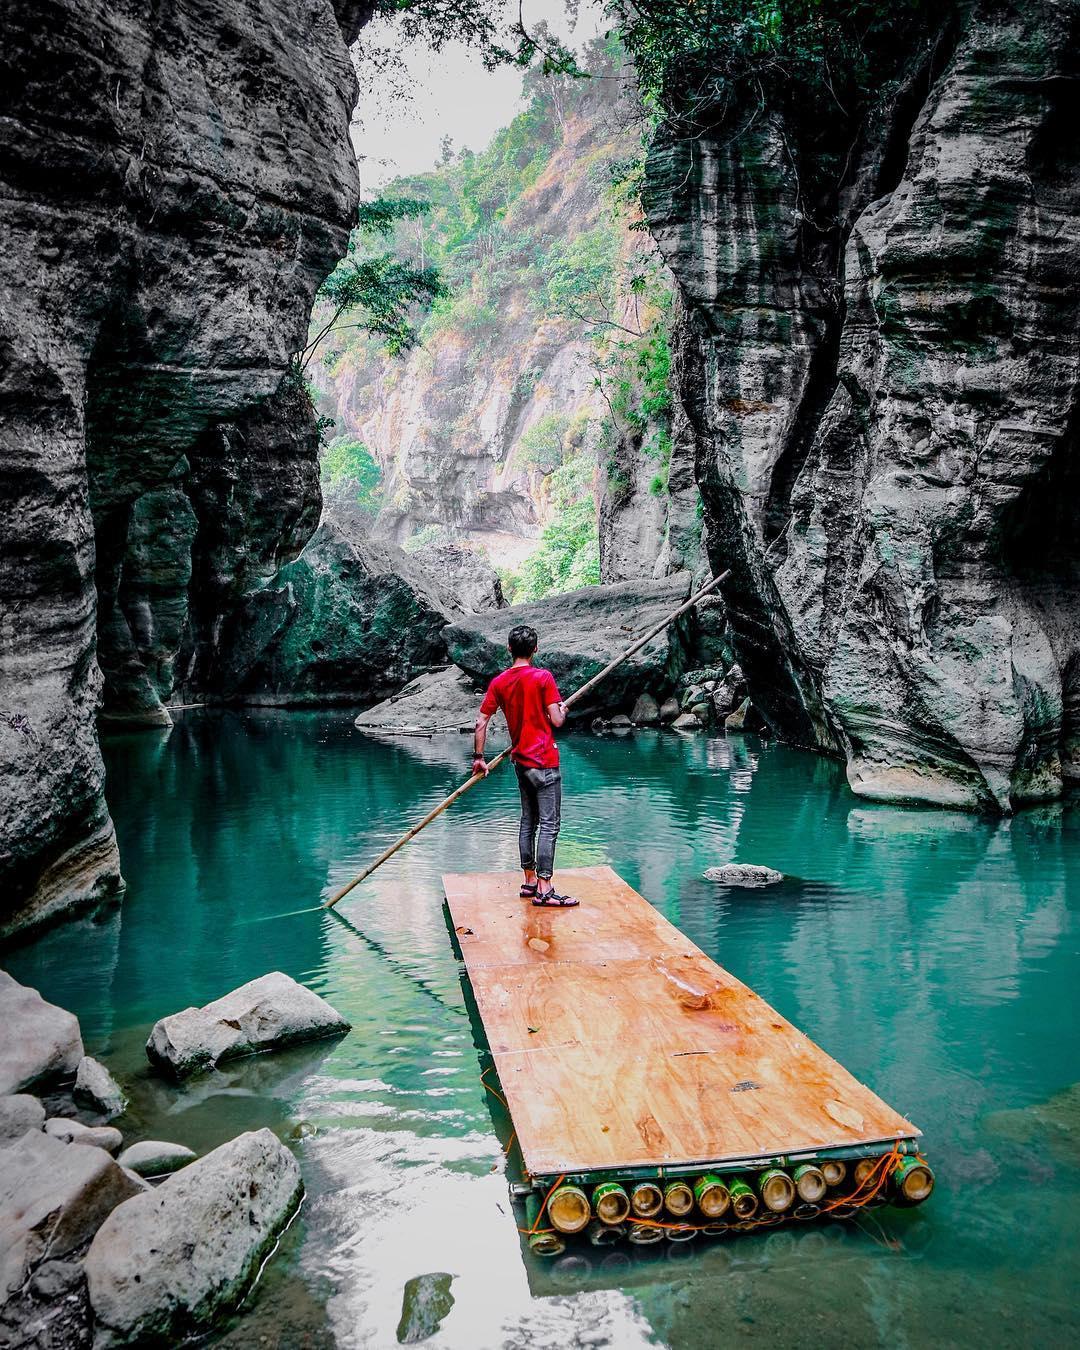 wisata sungai cikahuripan